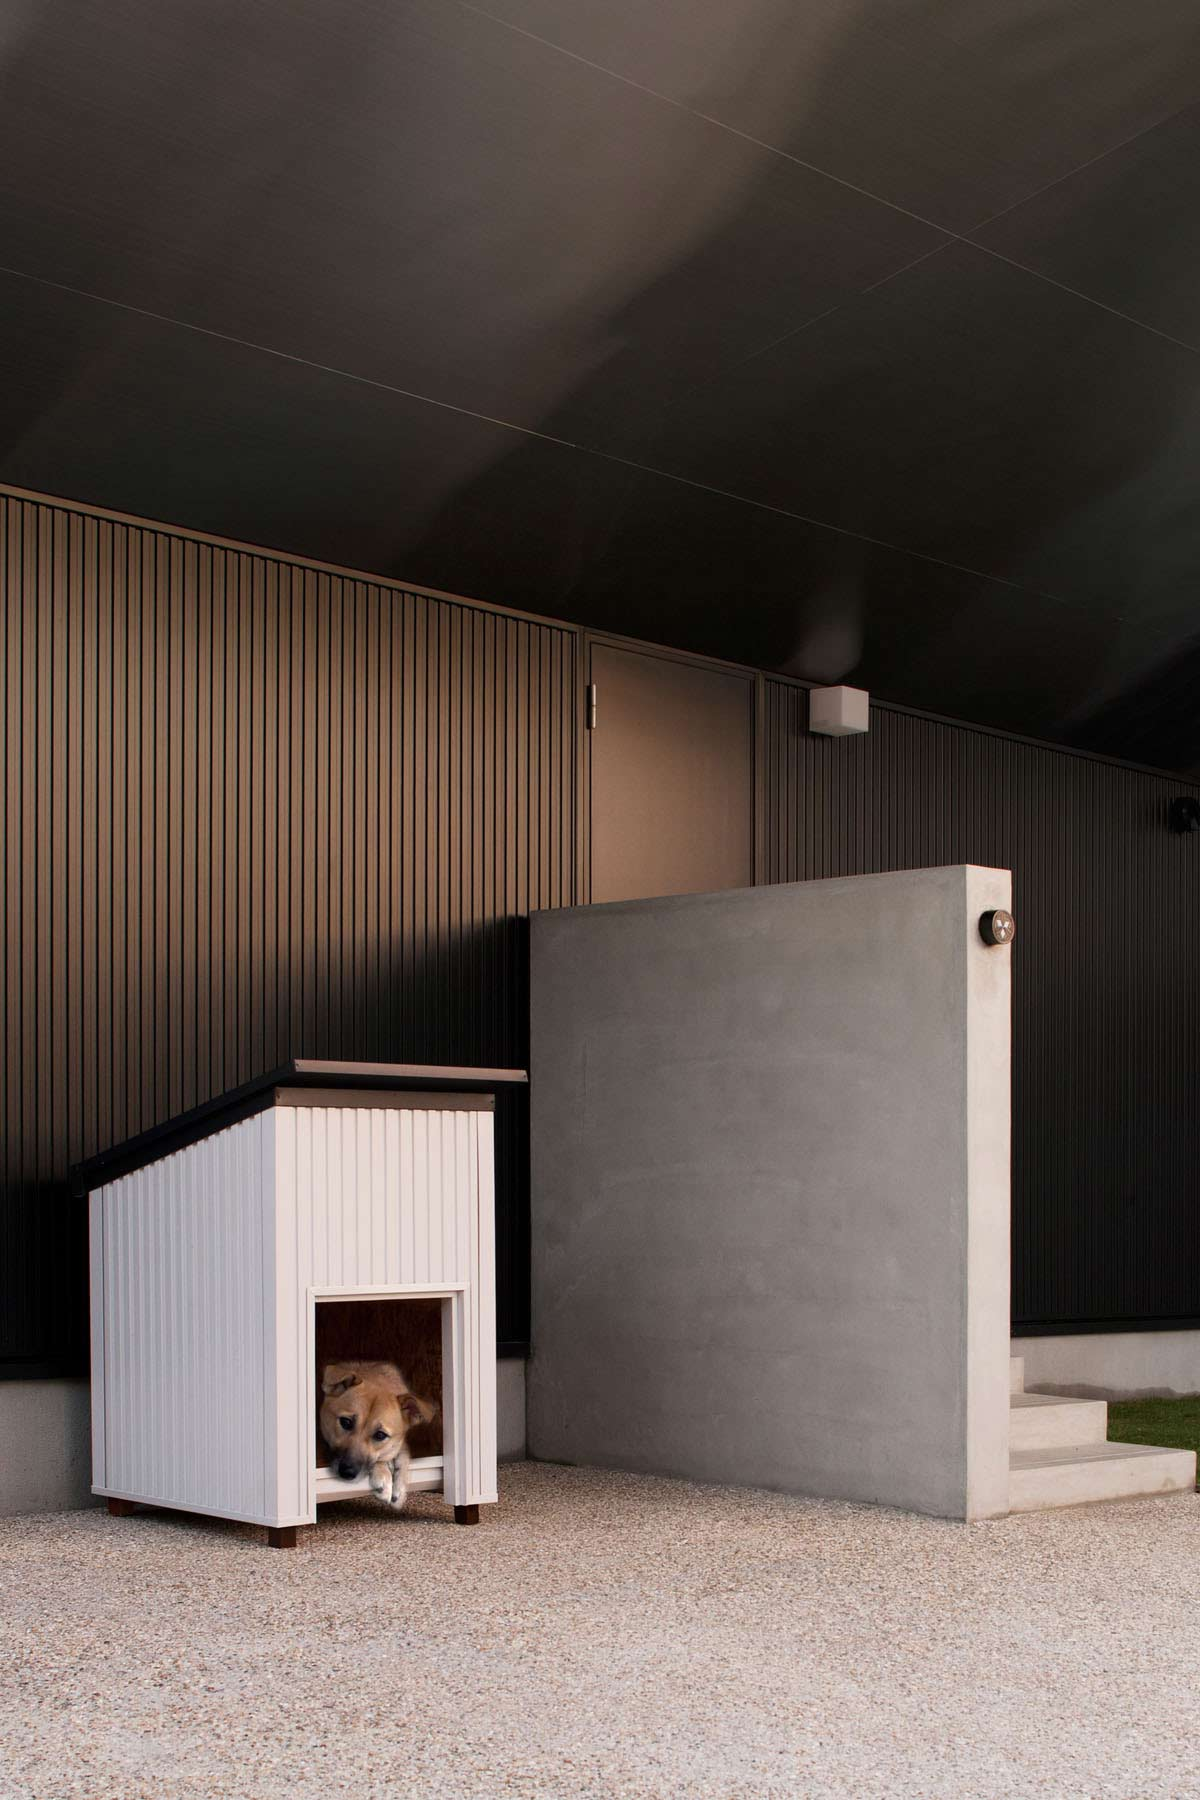 Dog House, Hansha Reflection House, Nagoya, Japan